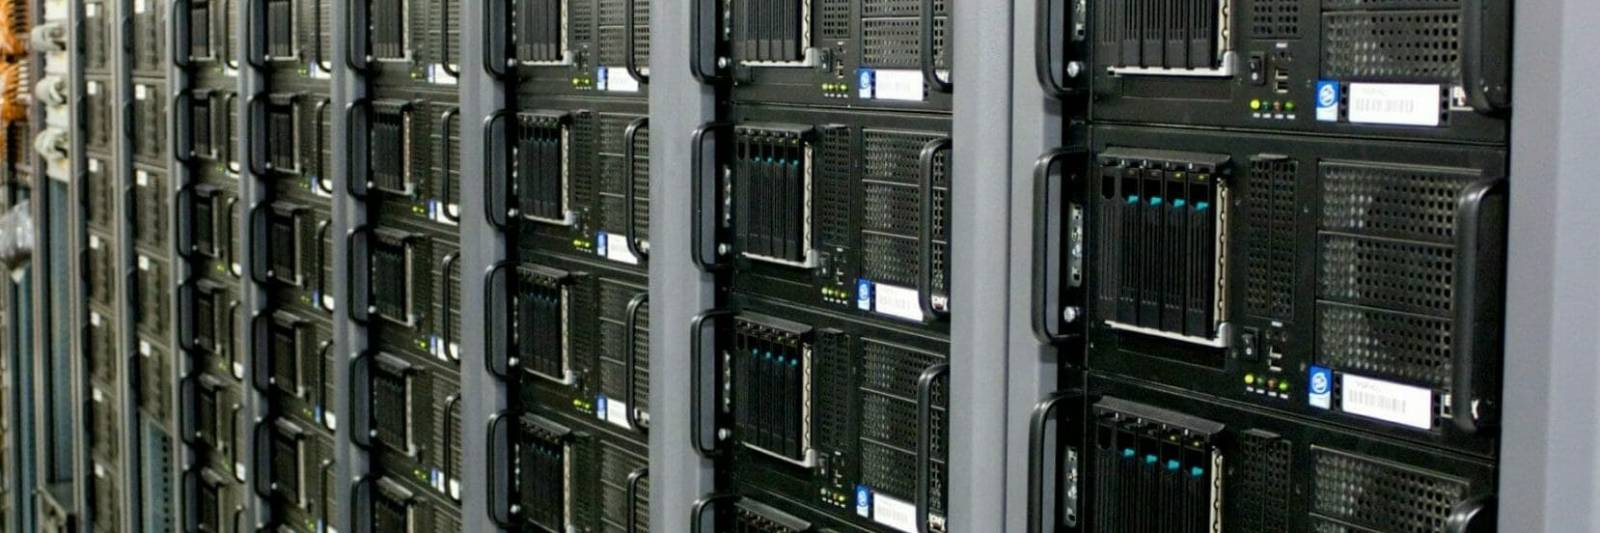 'turn off your heart': kaseya vsa ransomware hits msps in